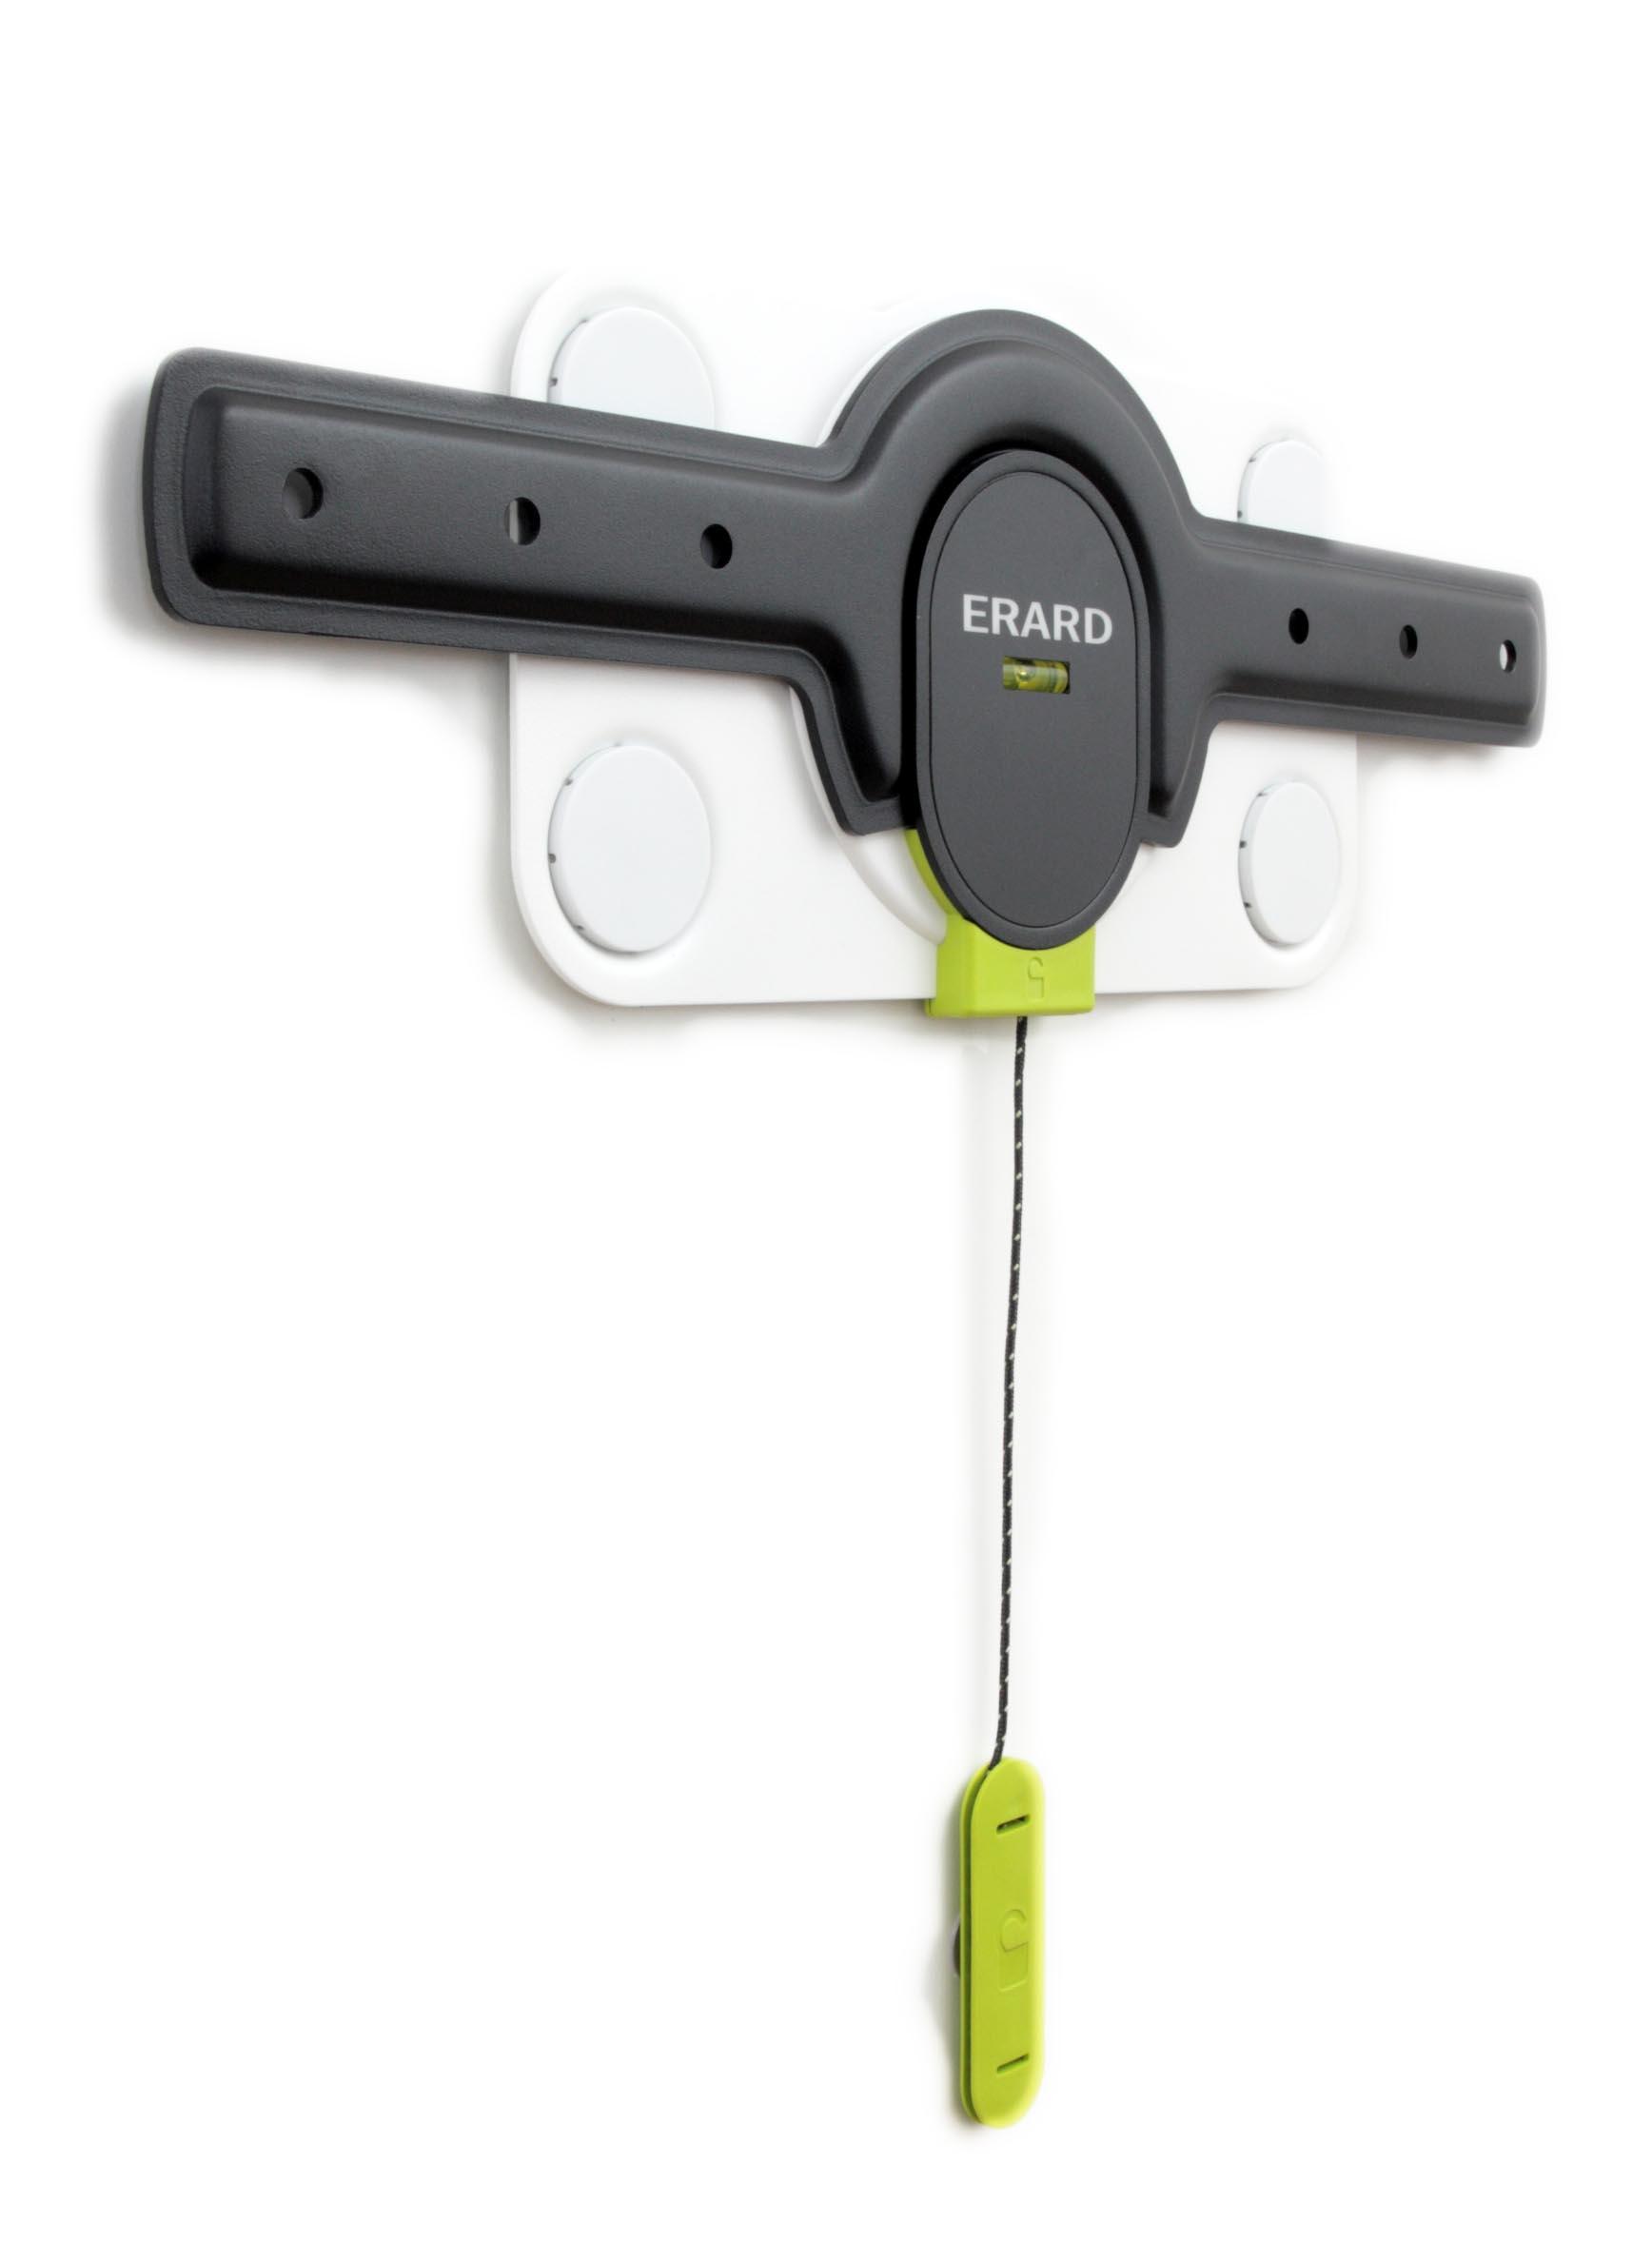 FiXiT 400 - ultra-thin fixed wall mount